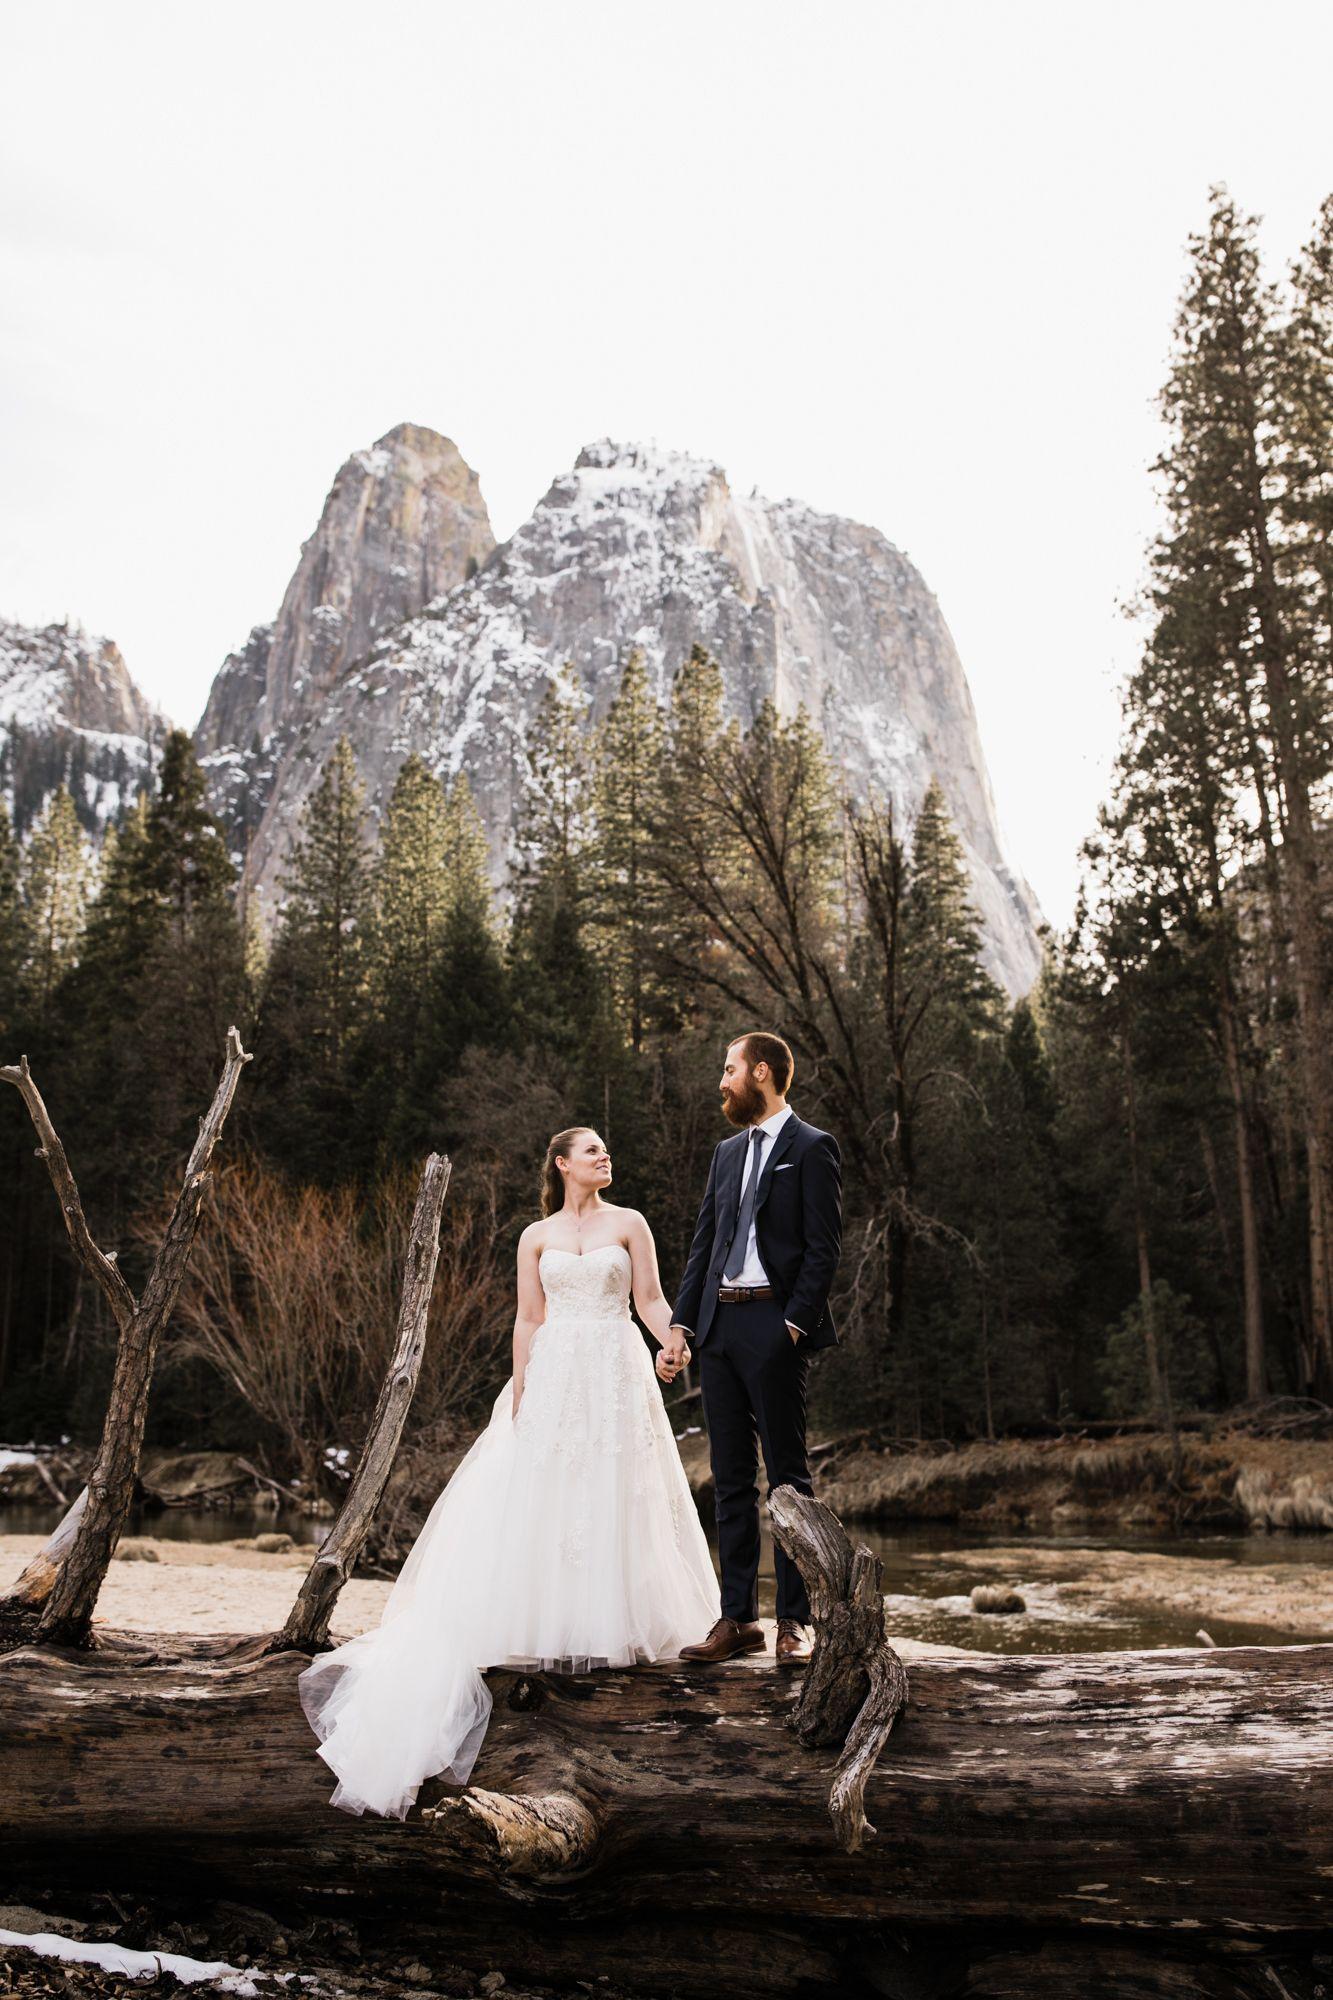 Winter Elopement In Yosemite National Park Yosemite Wedding Photographer Adventure Wedding Elopement Photographers In Moab Yosemite And Beyond The Hea Yosemite Wedding Elope Wedding Winter Elopement